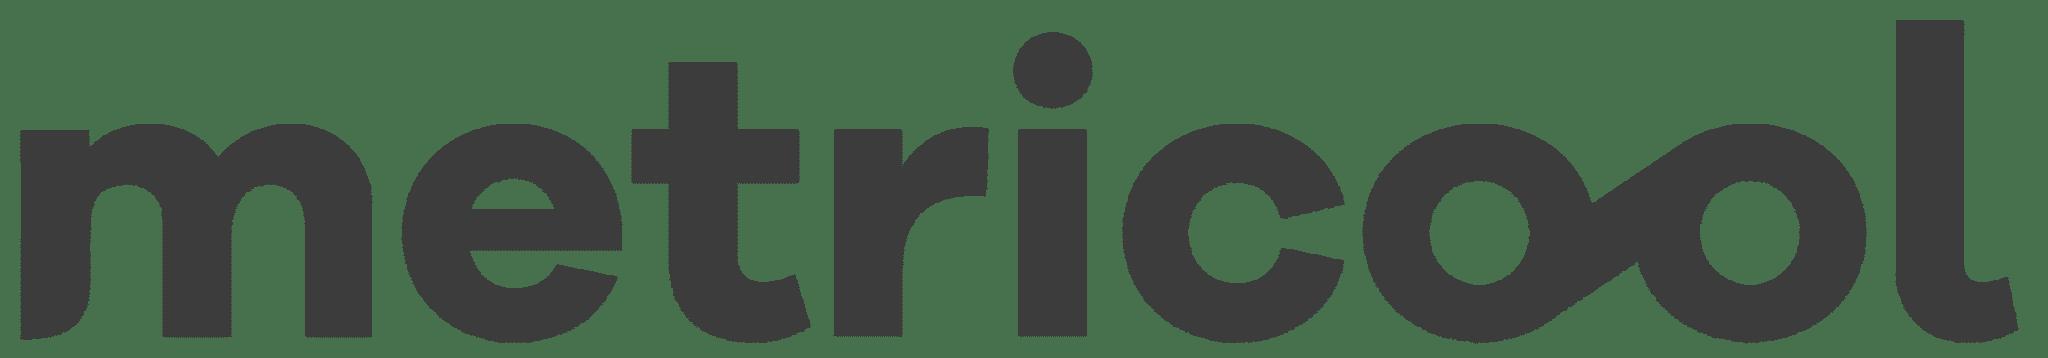 Metricool Logo Informes redes sociales